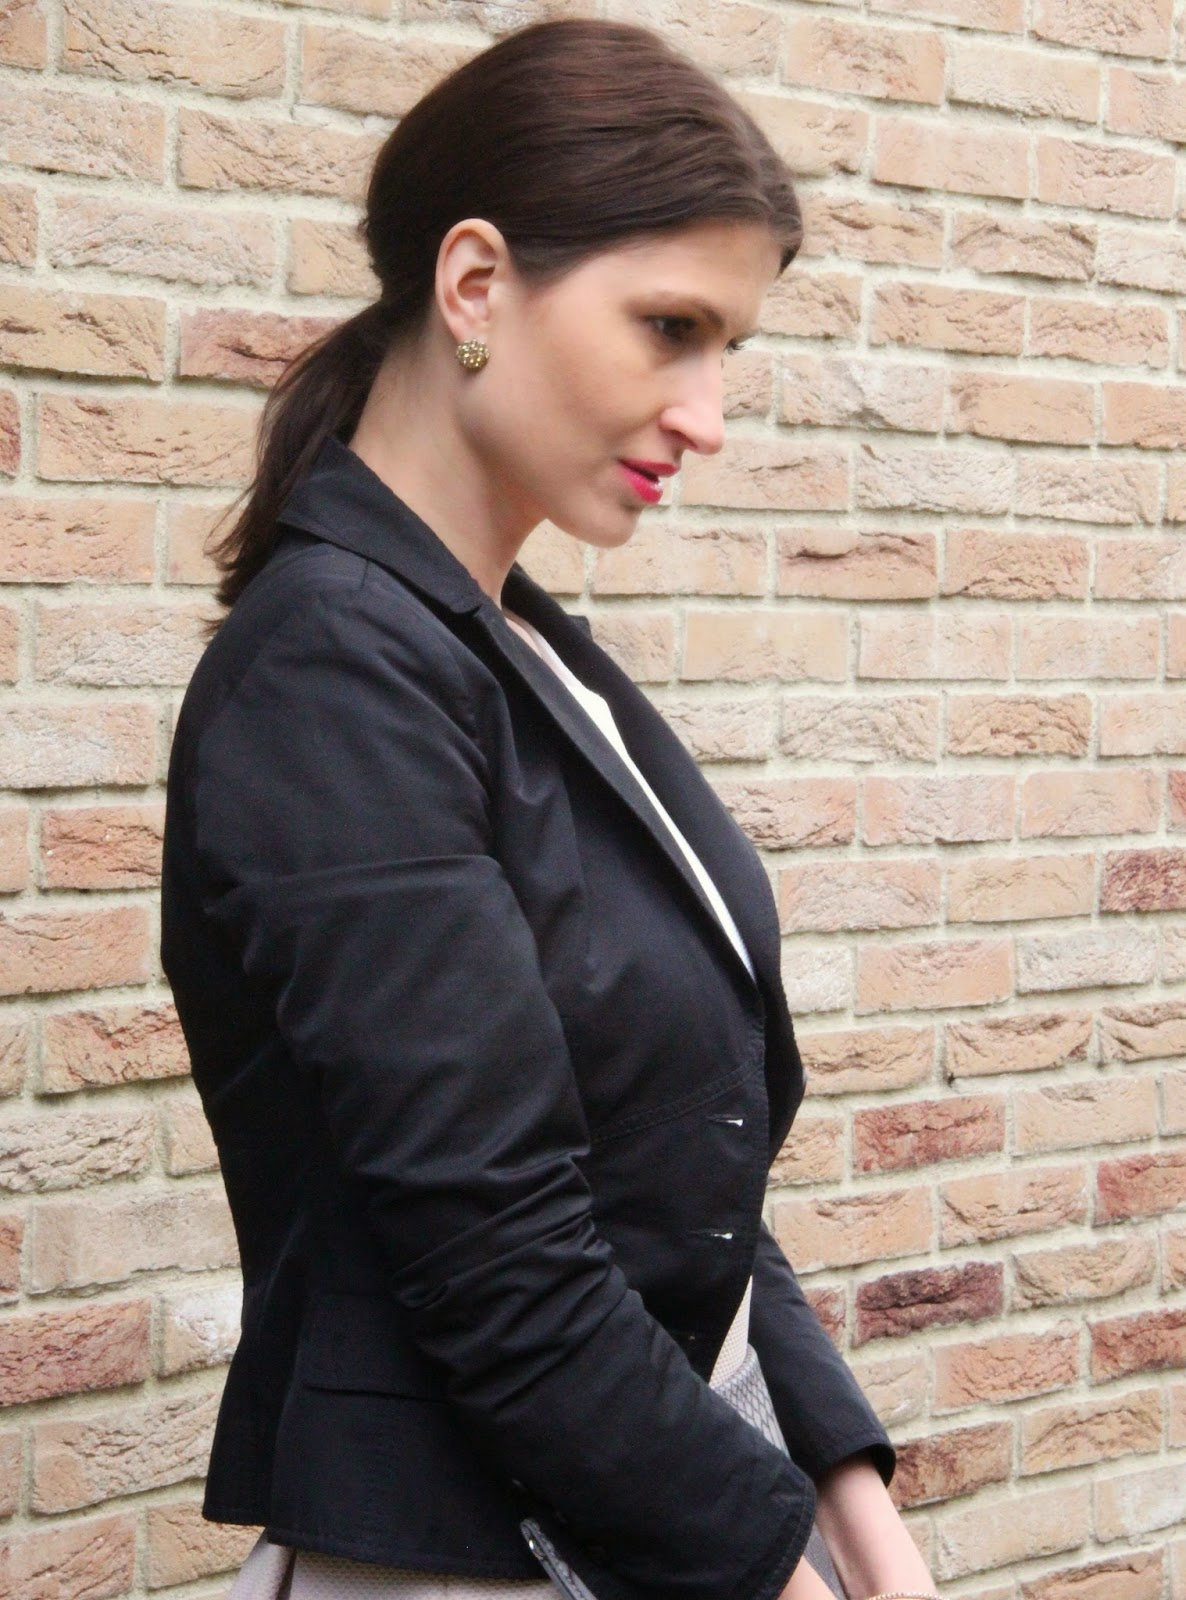 sukienka rozkloszowana, spodnica rozkloszowana, maxi kopertowka, lady like, zegarek michael kors,